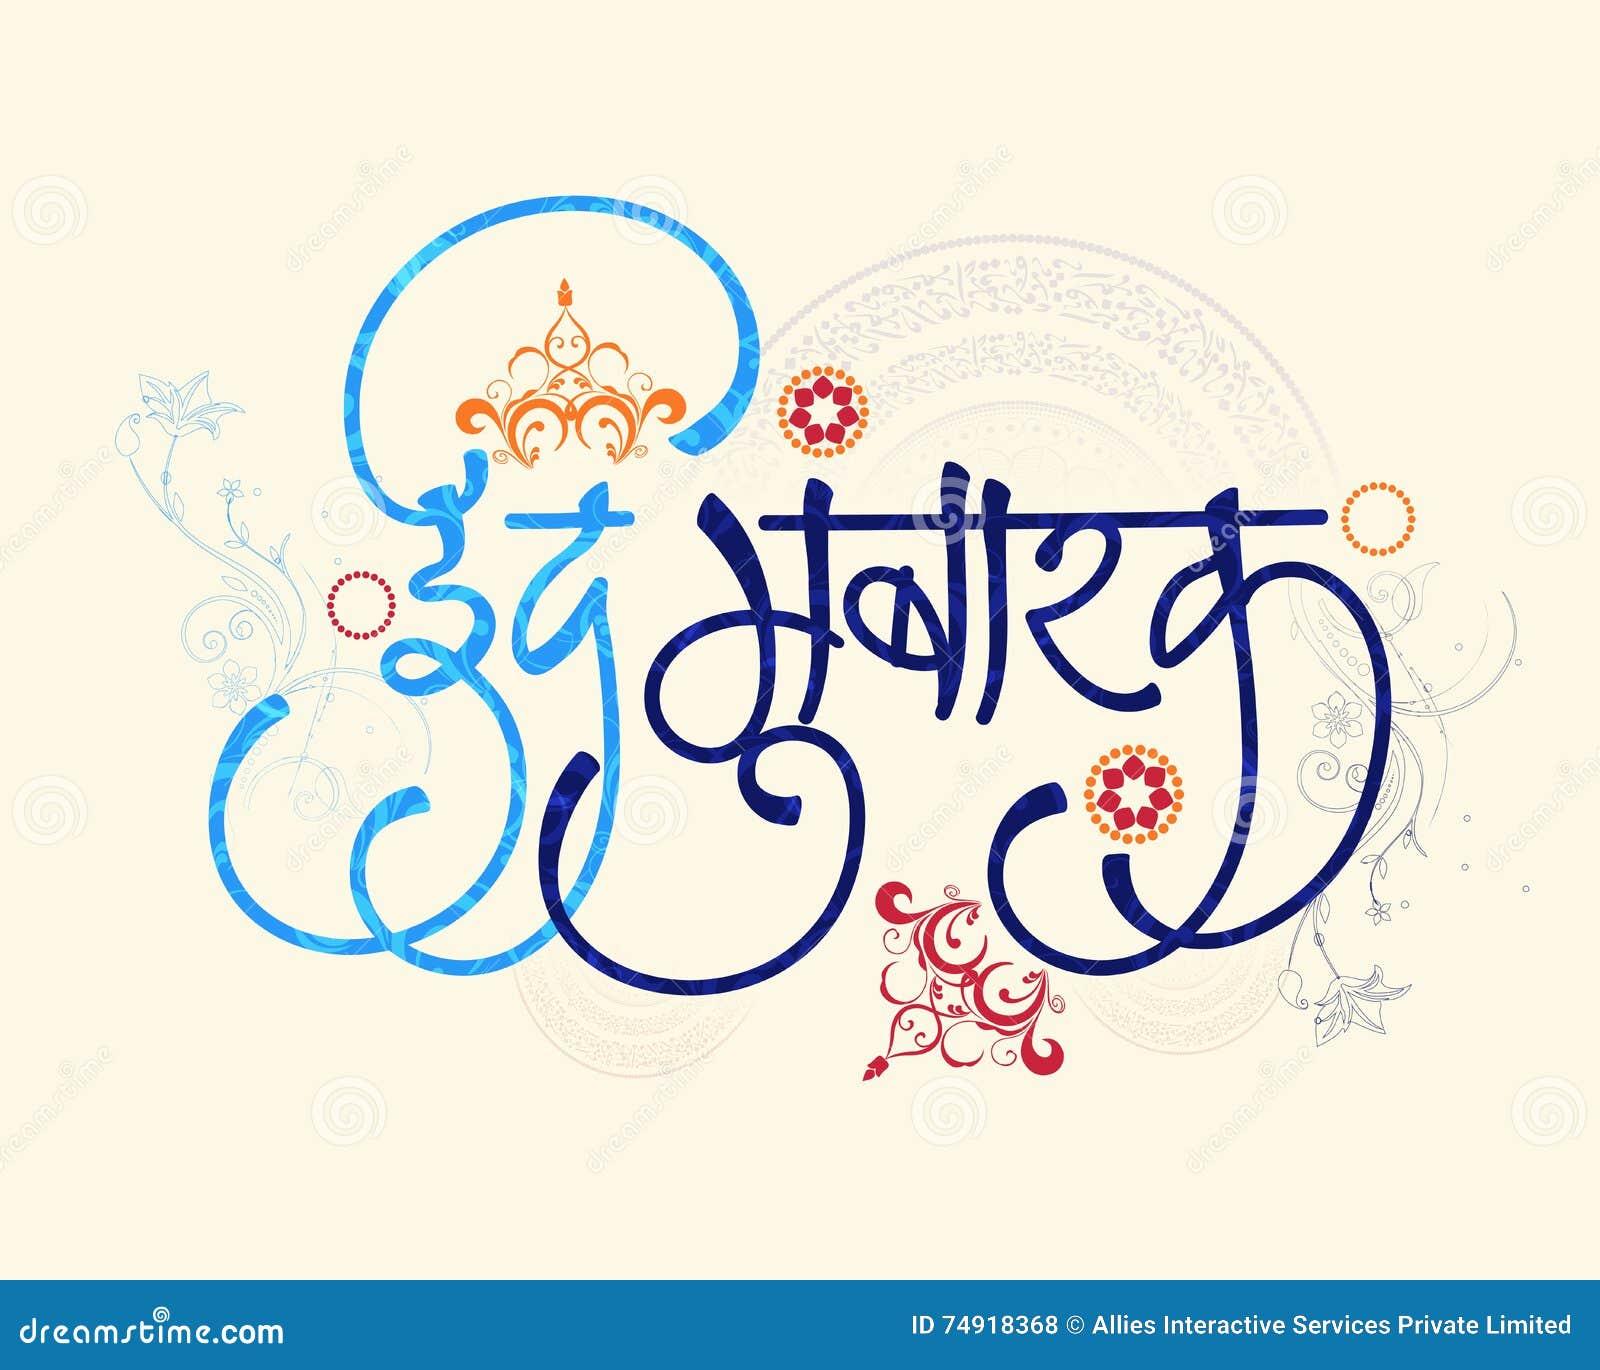 Greeting card with hindi text for eid mubarak stock illustration greeting card with hindi text for eid mubarak m4hsunfo